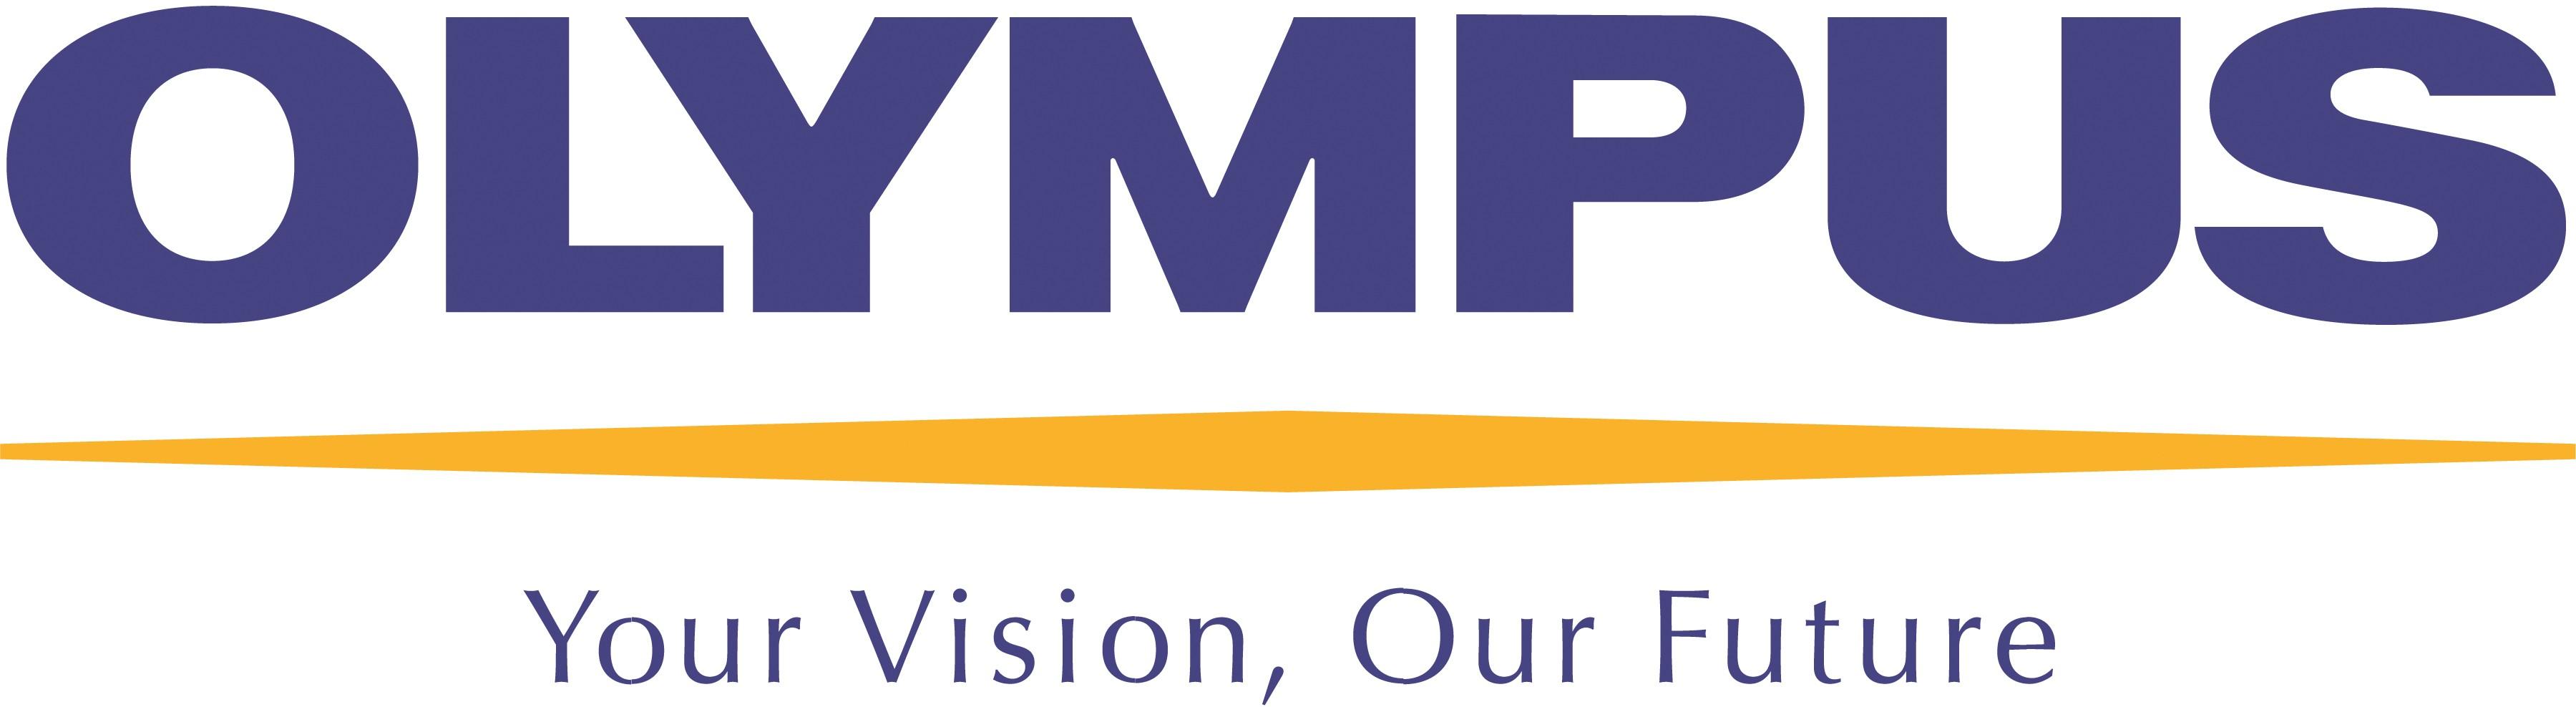 Olympus Corp logo